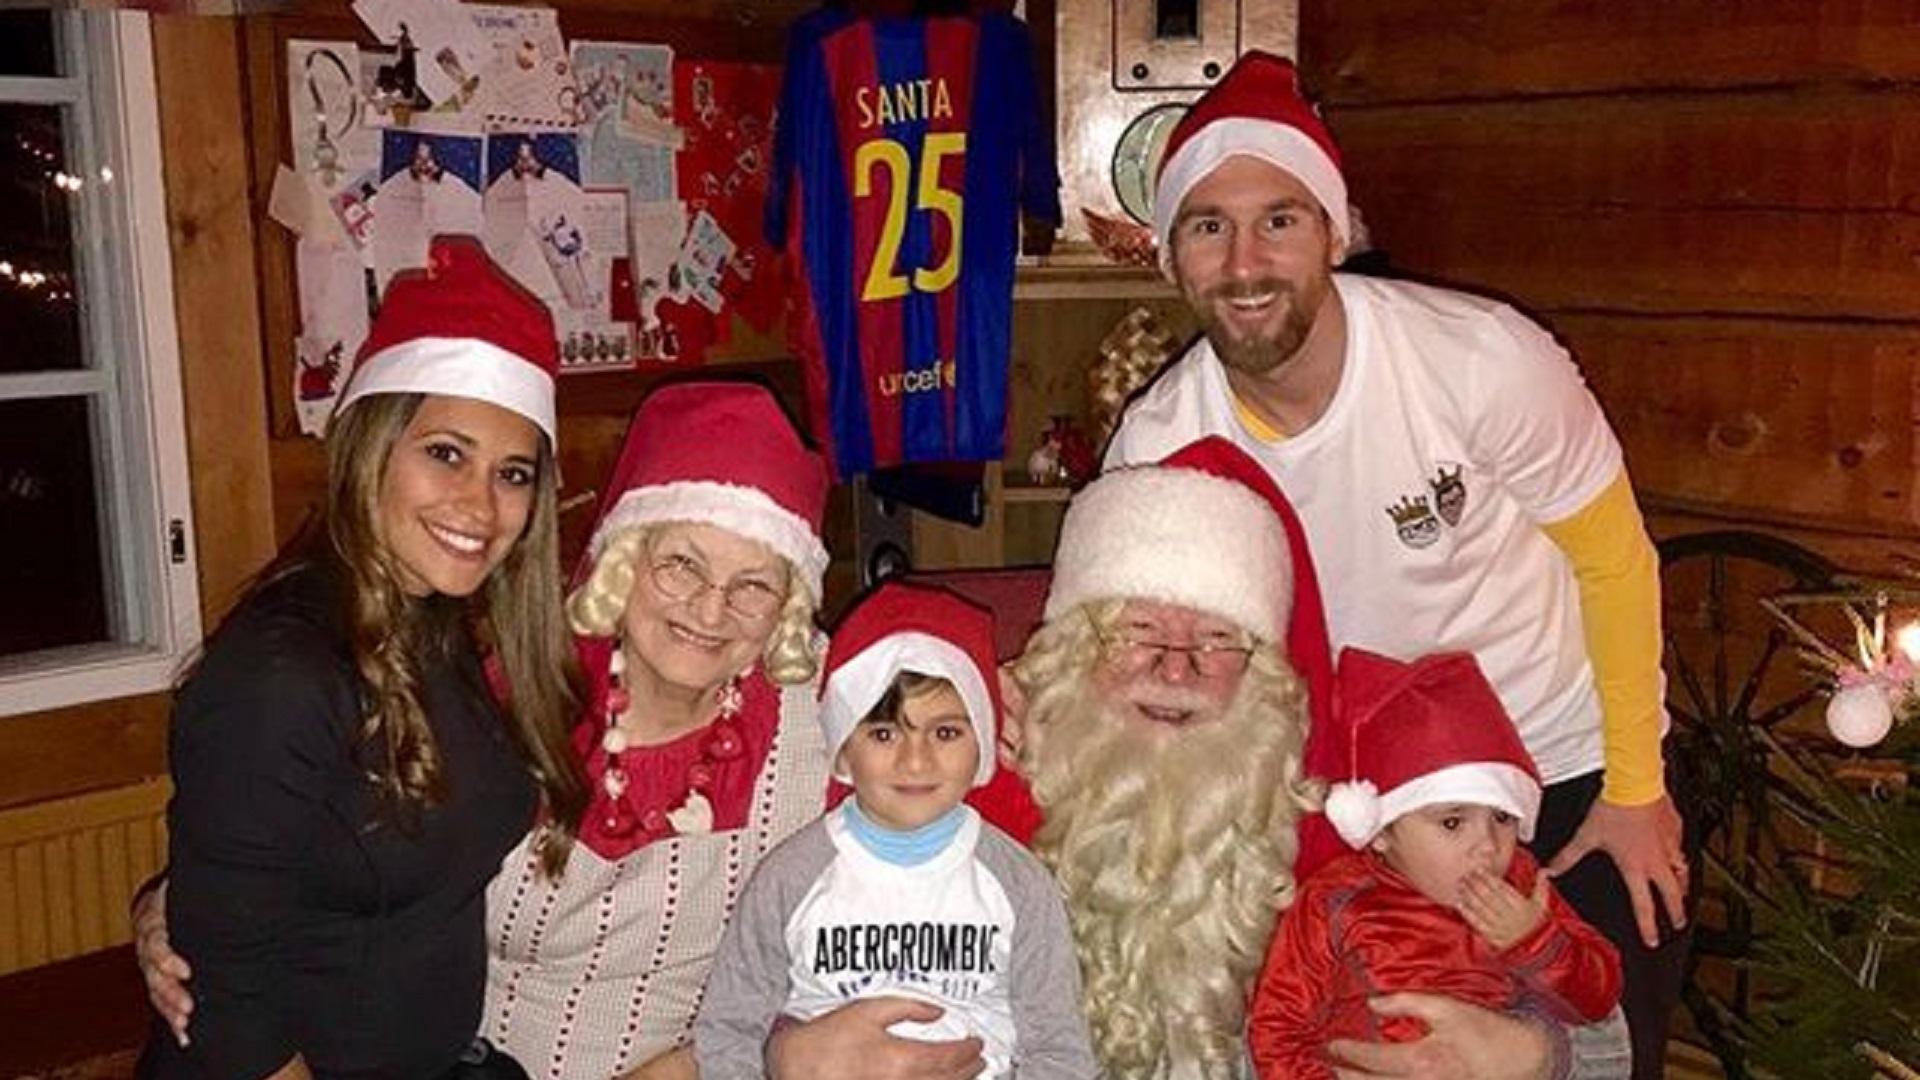 Messi, Ronaldo & footballers around the world celebrate Christmas